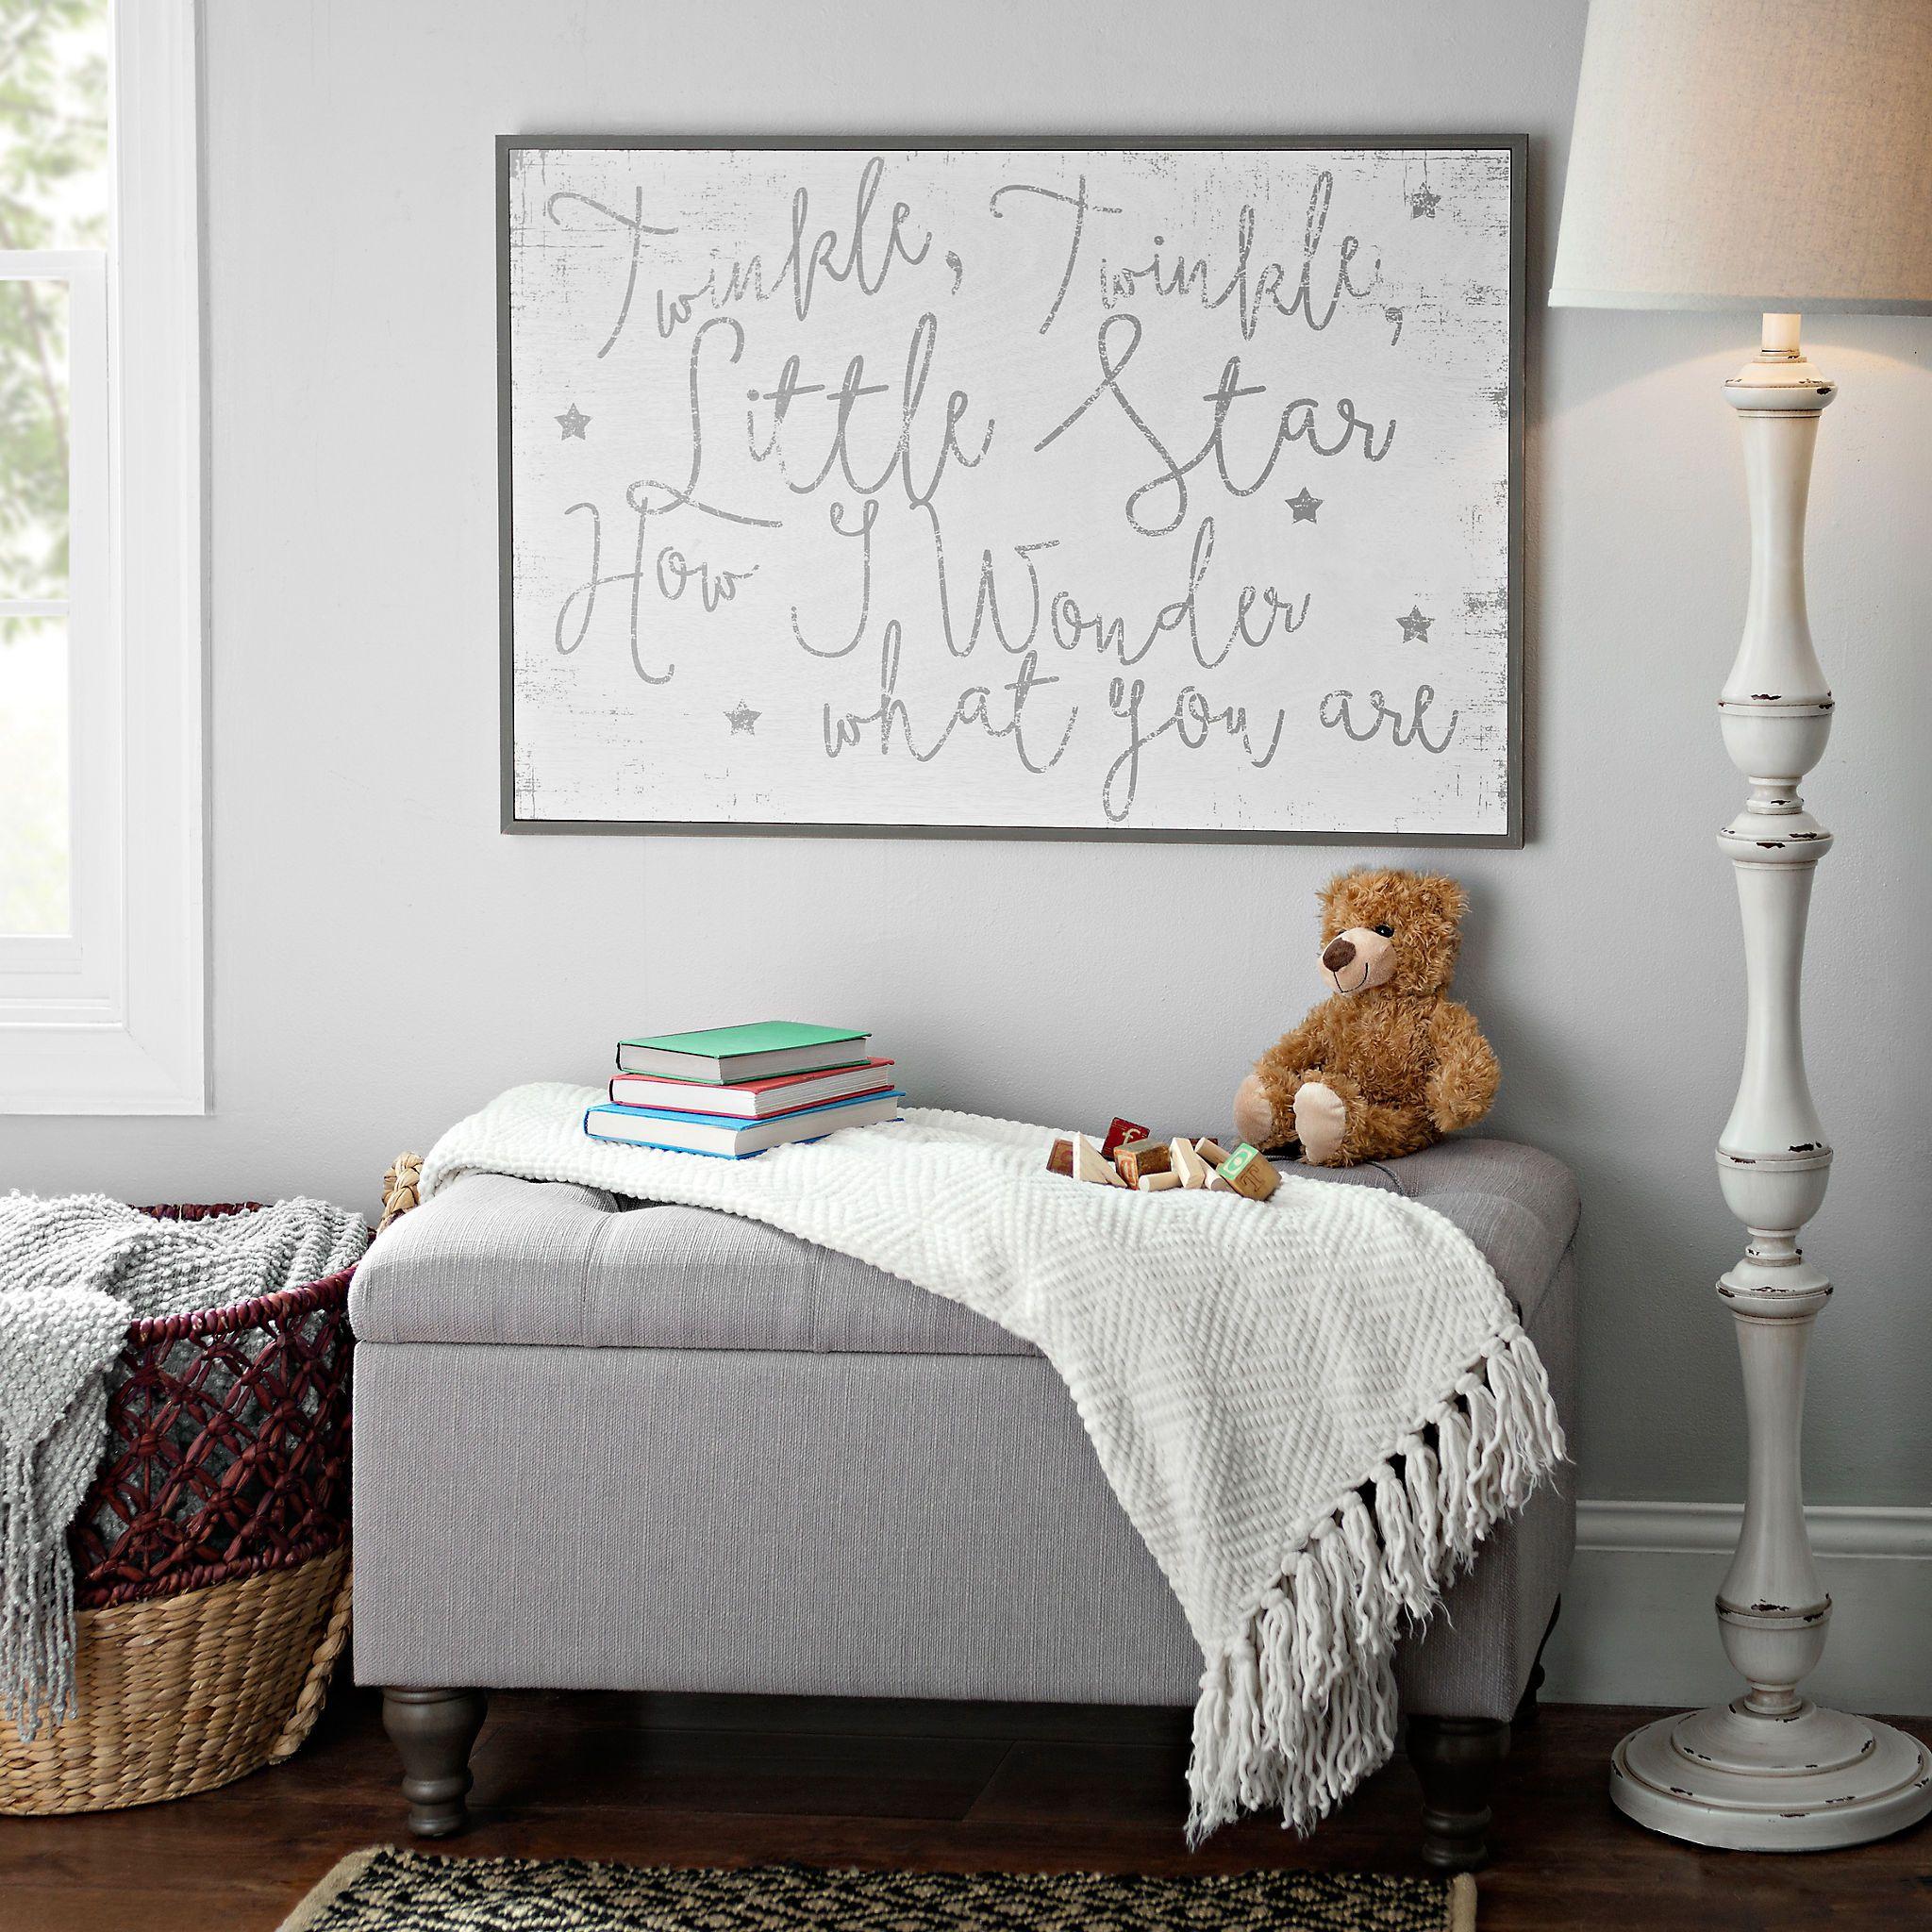 bedroom wall plaques. Twinkle Little Star Wooden Wall Plaque | Kirklands Bedroom Plaques